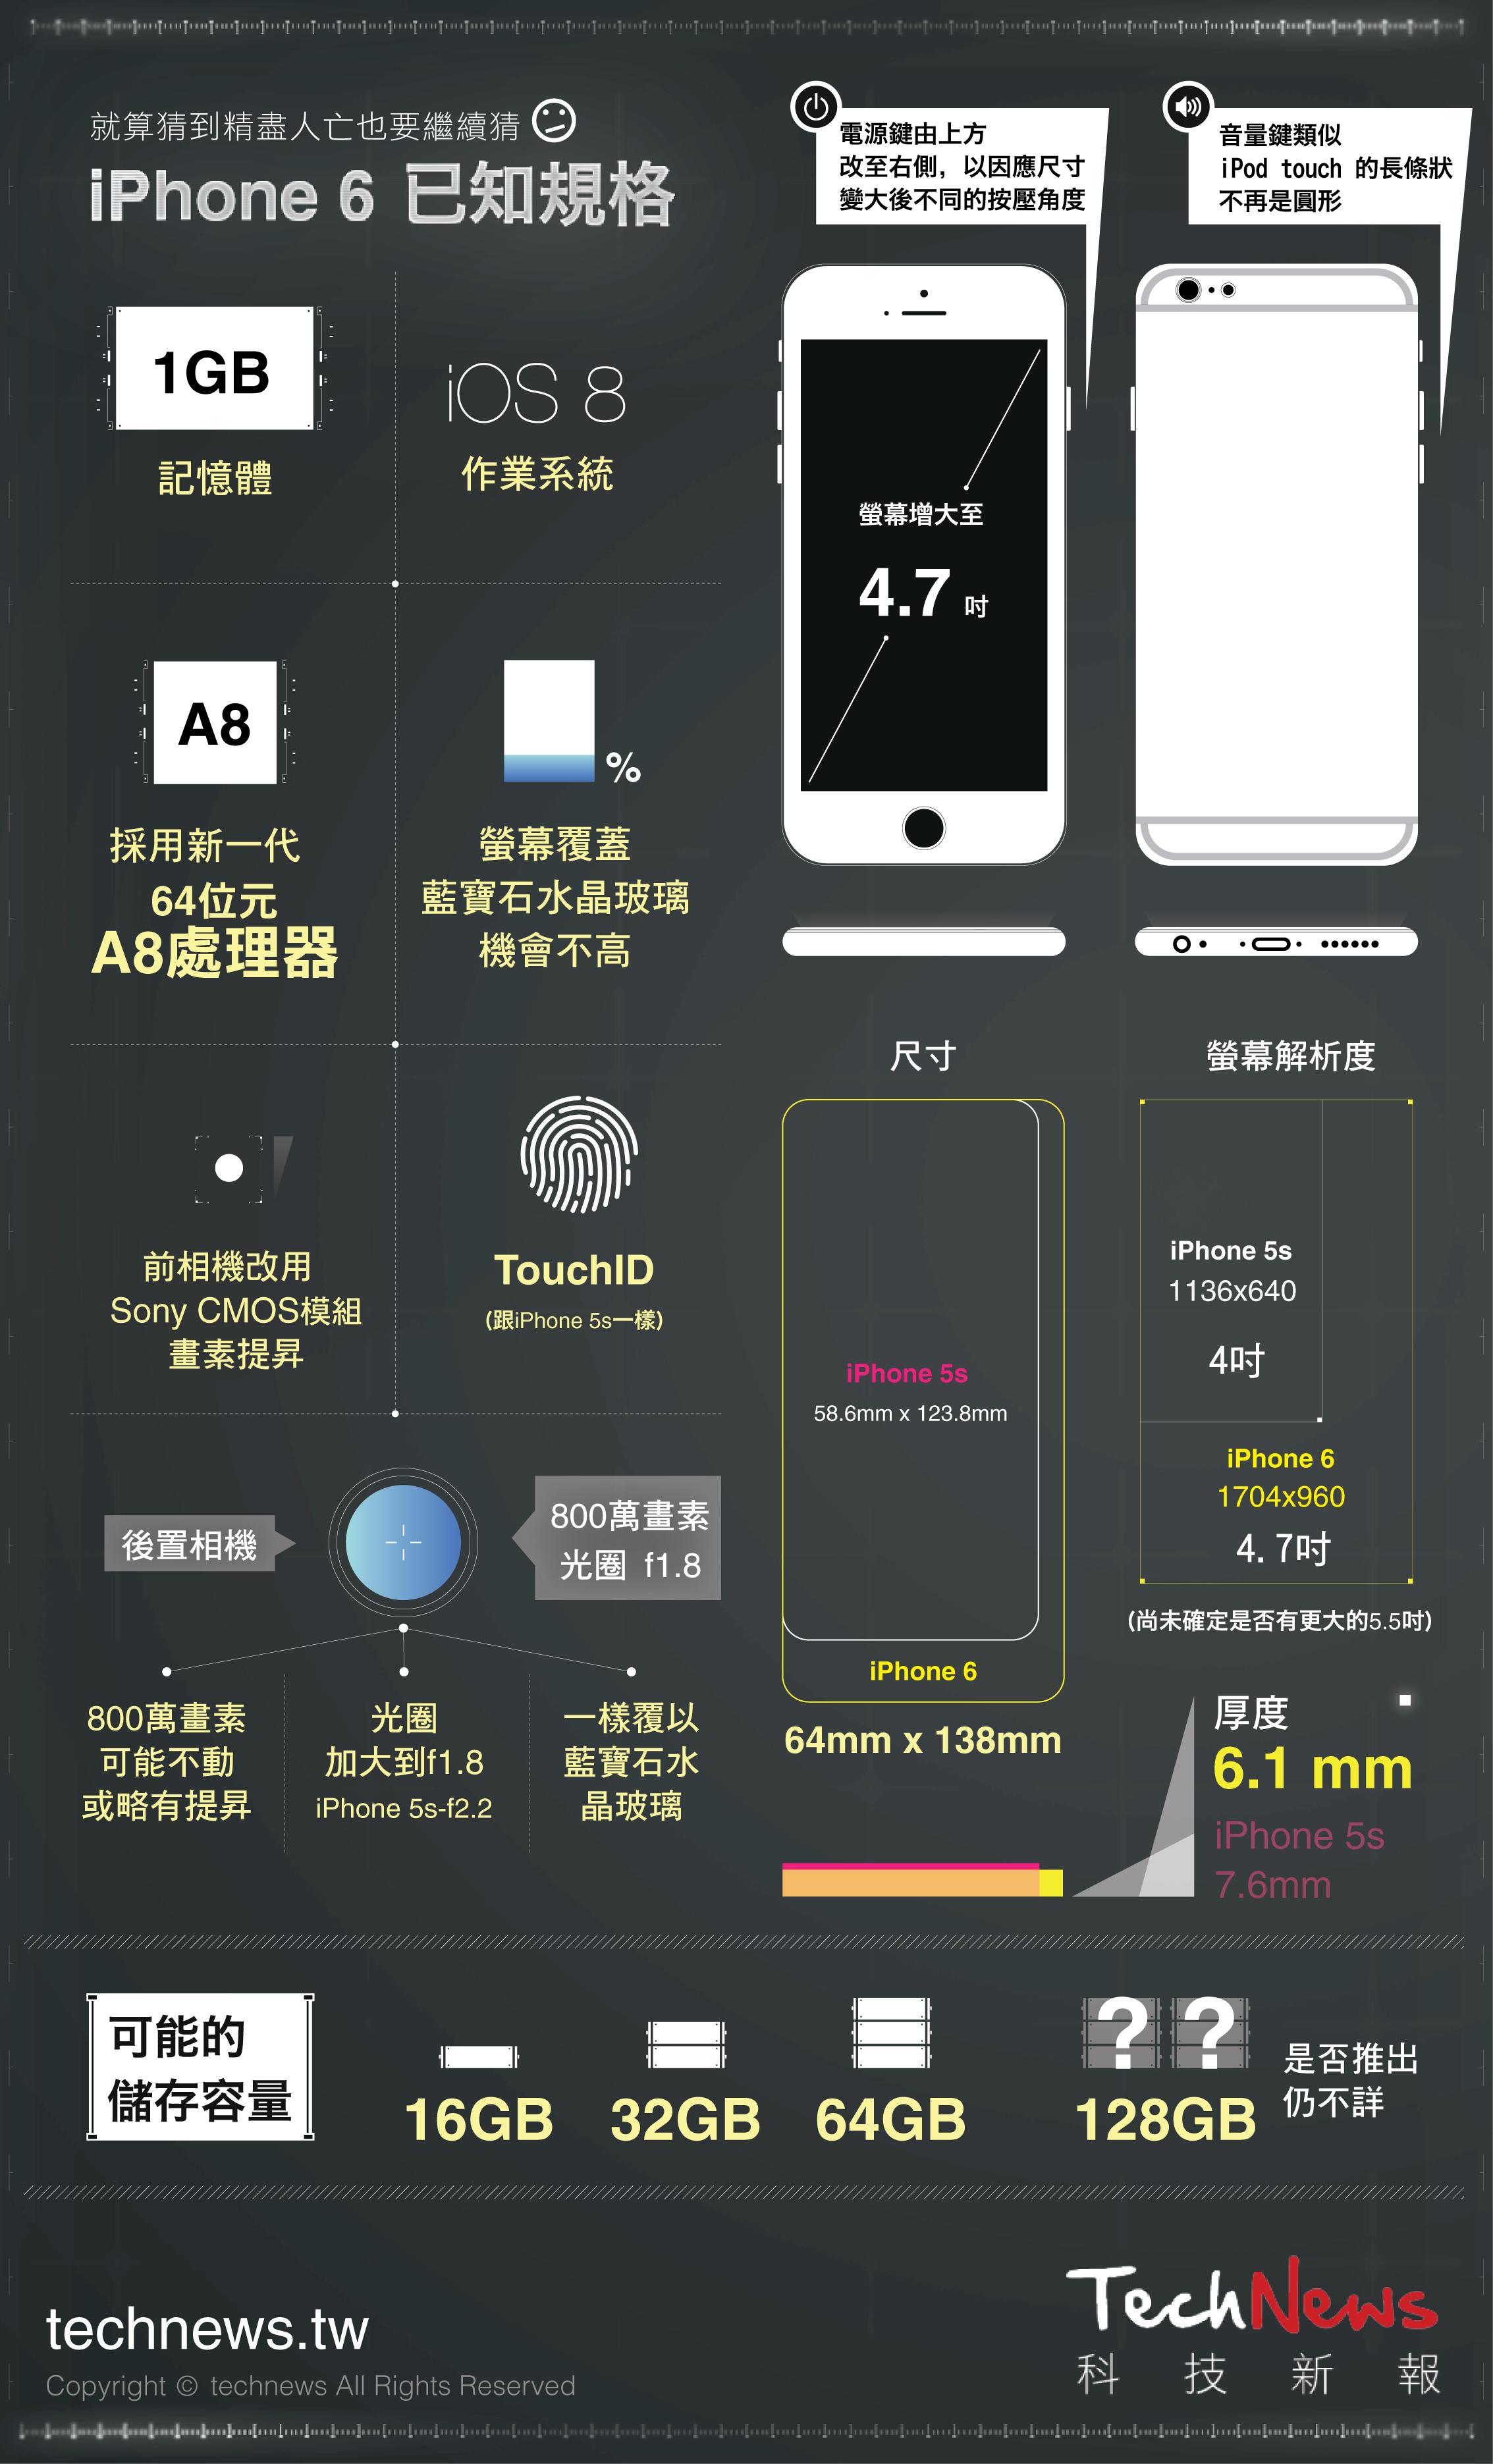 2014 iPhone 6 info graphic